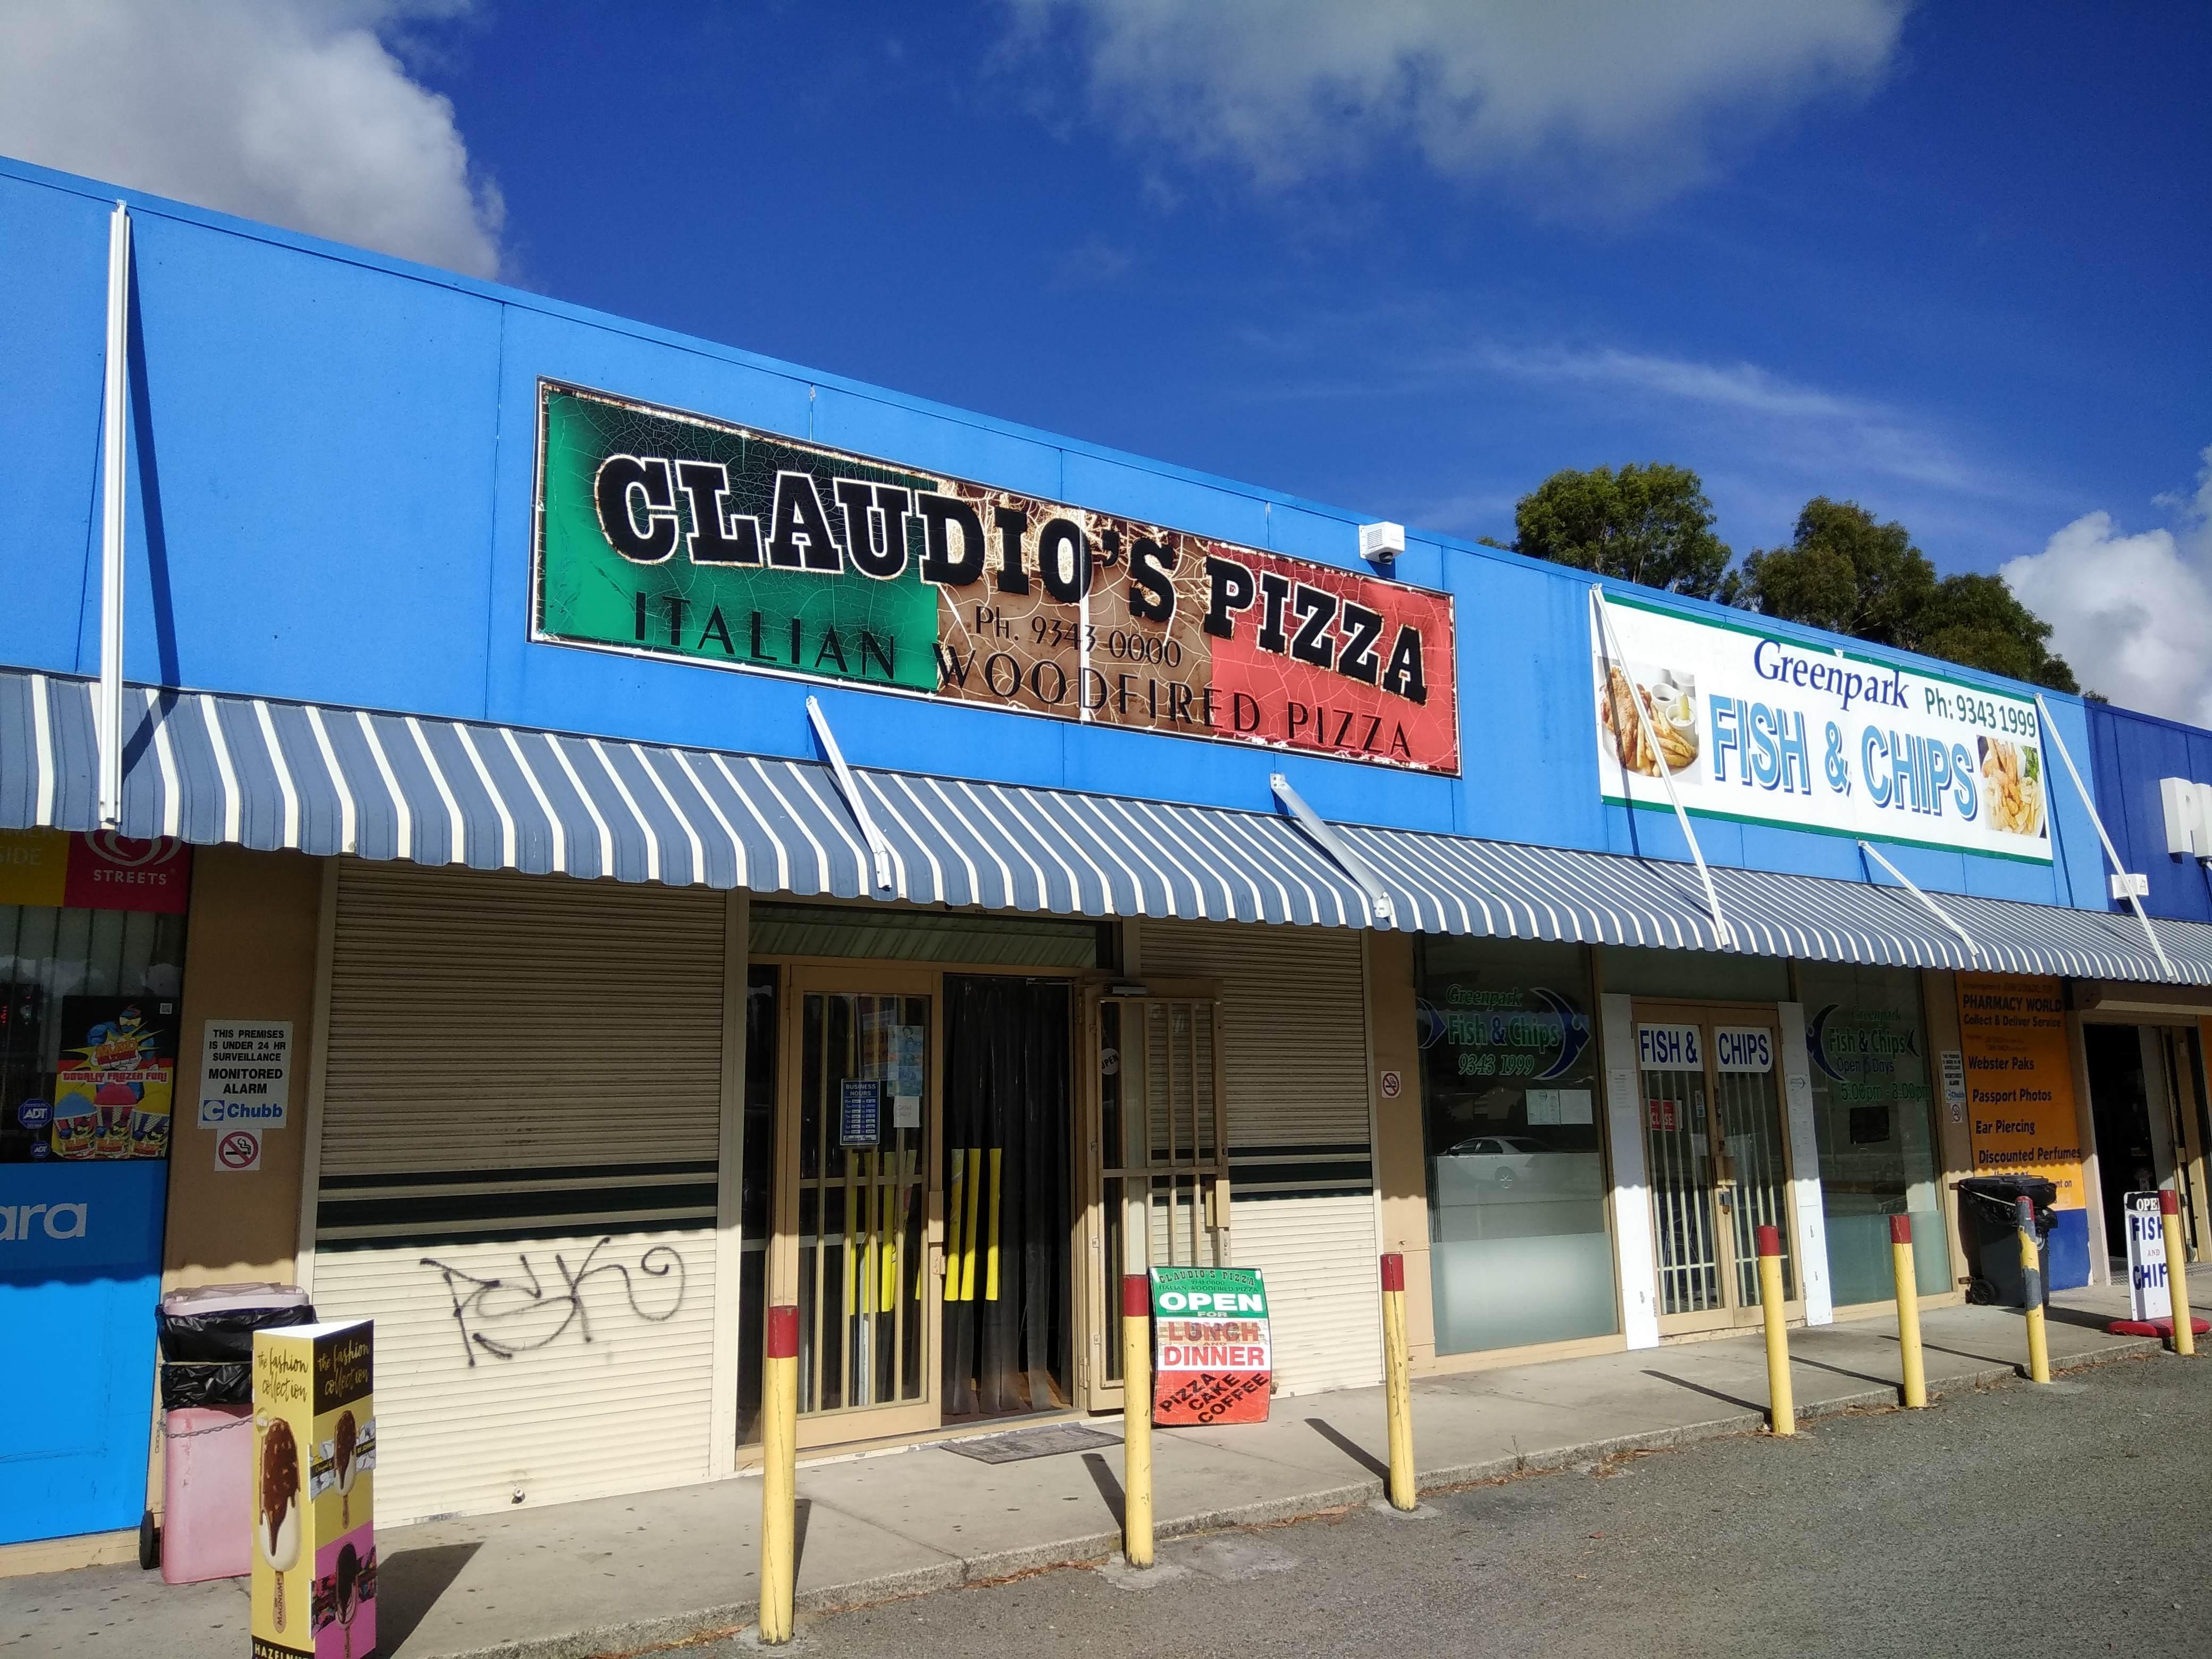 Claudio's Pizza- Woodfire Urgent Sale Neg ROI 120%